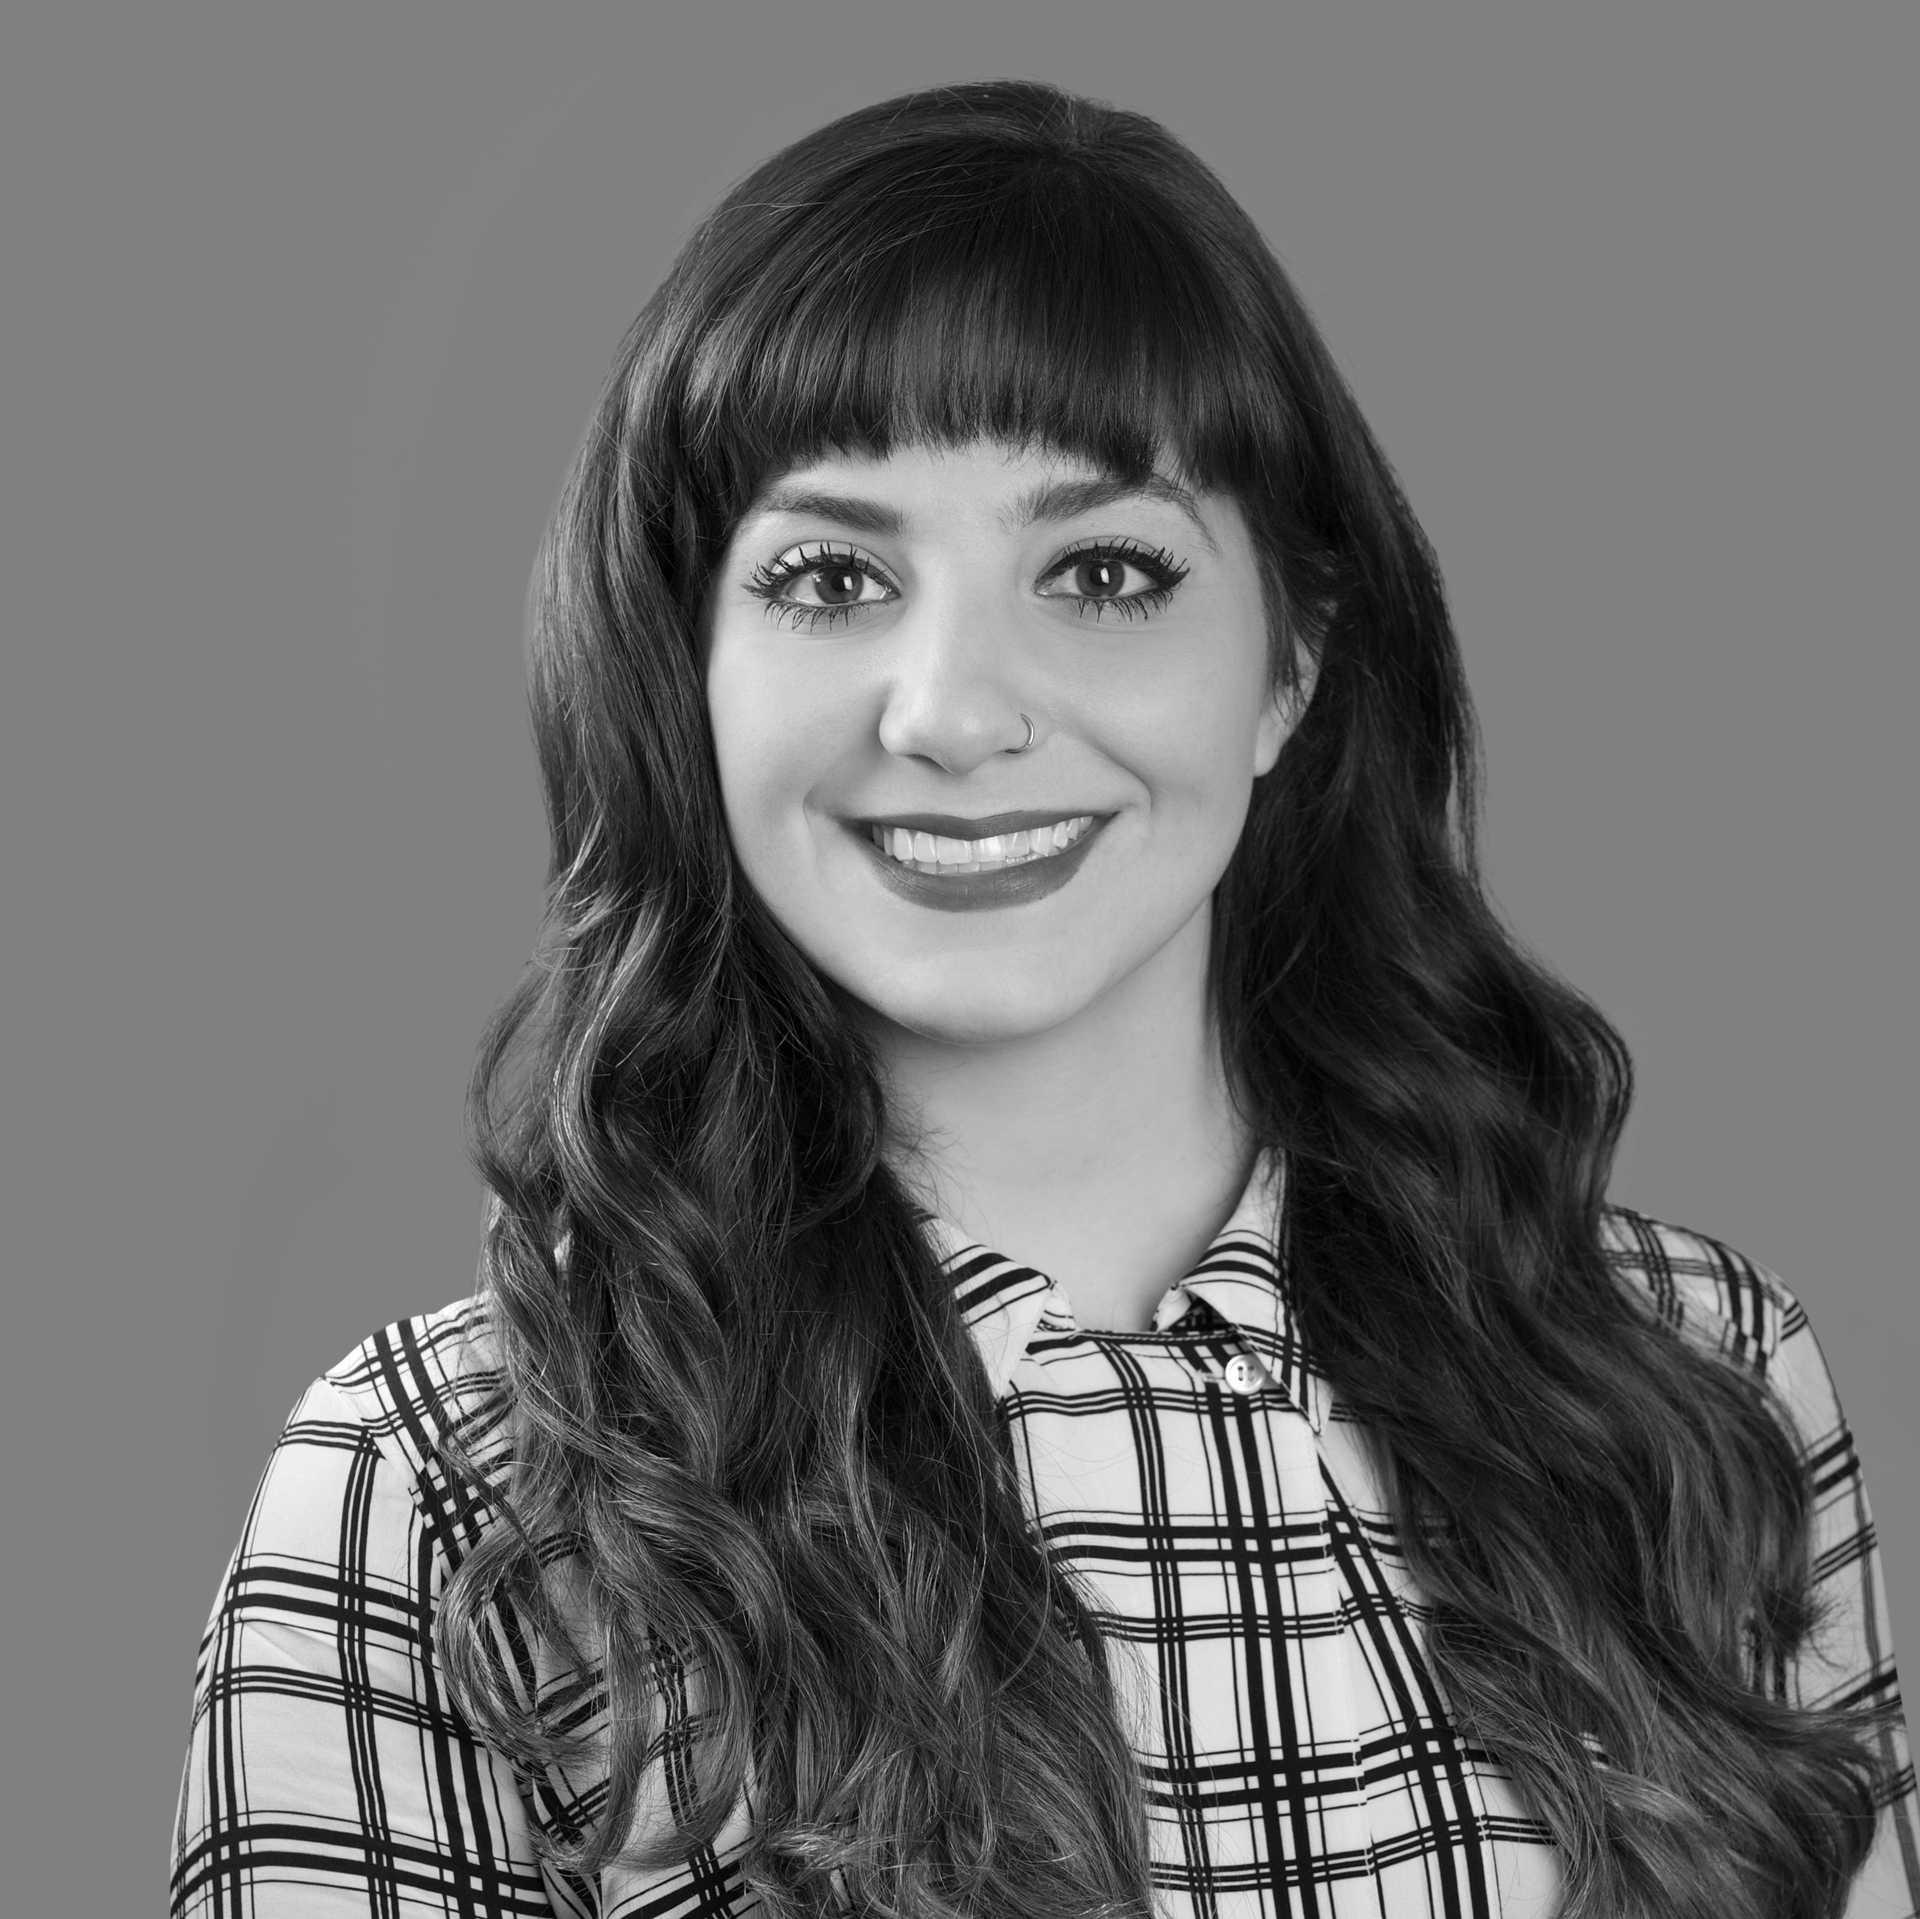 Marlin Hawk New York's Head of Client Development and Strategy Yasmine Nejdawi